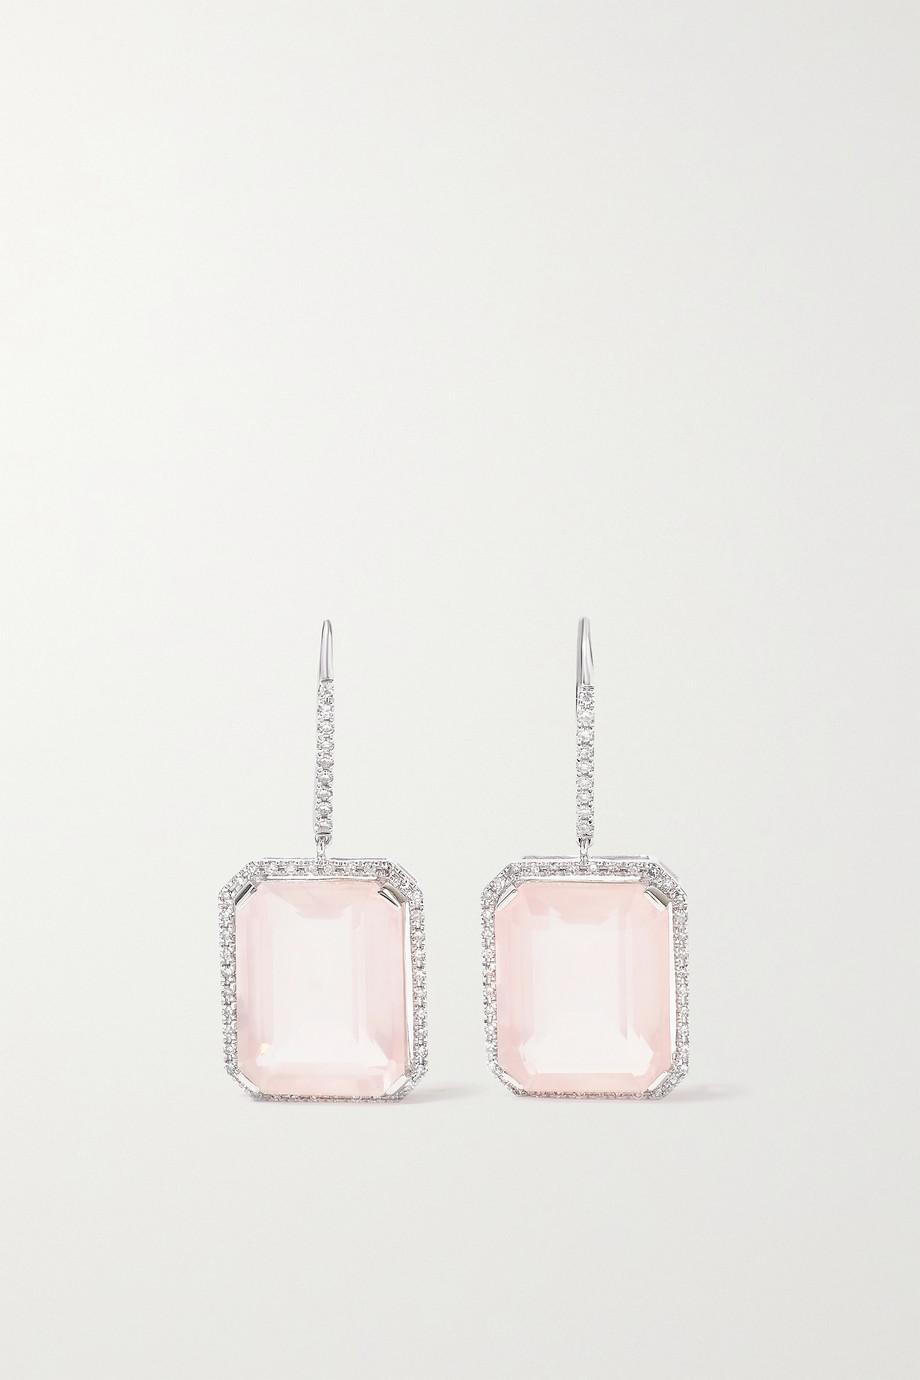 SHAY 18-karat white gold, crystal and diamond earrings